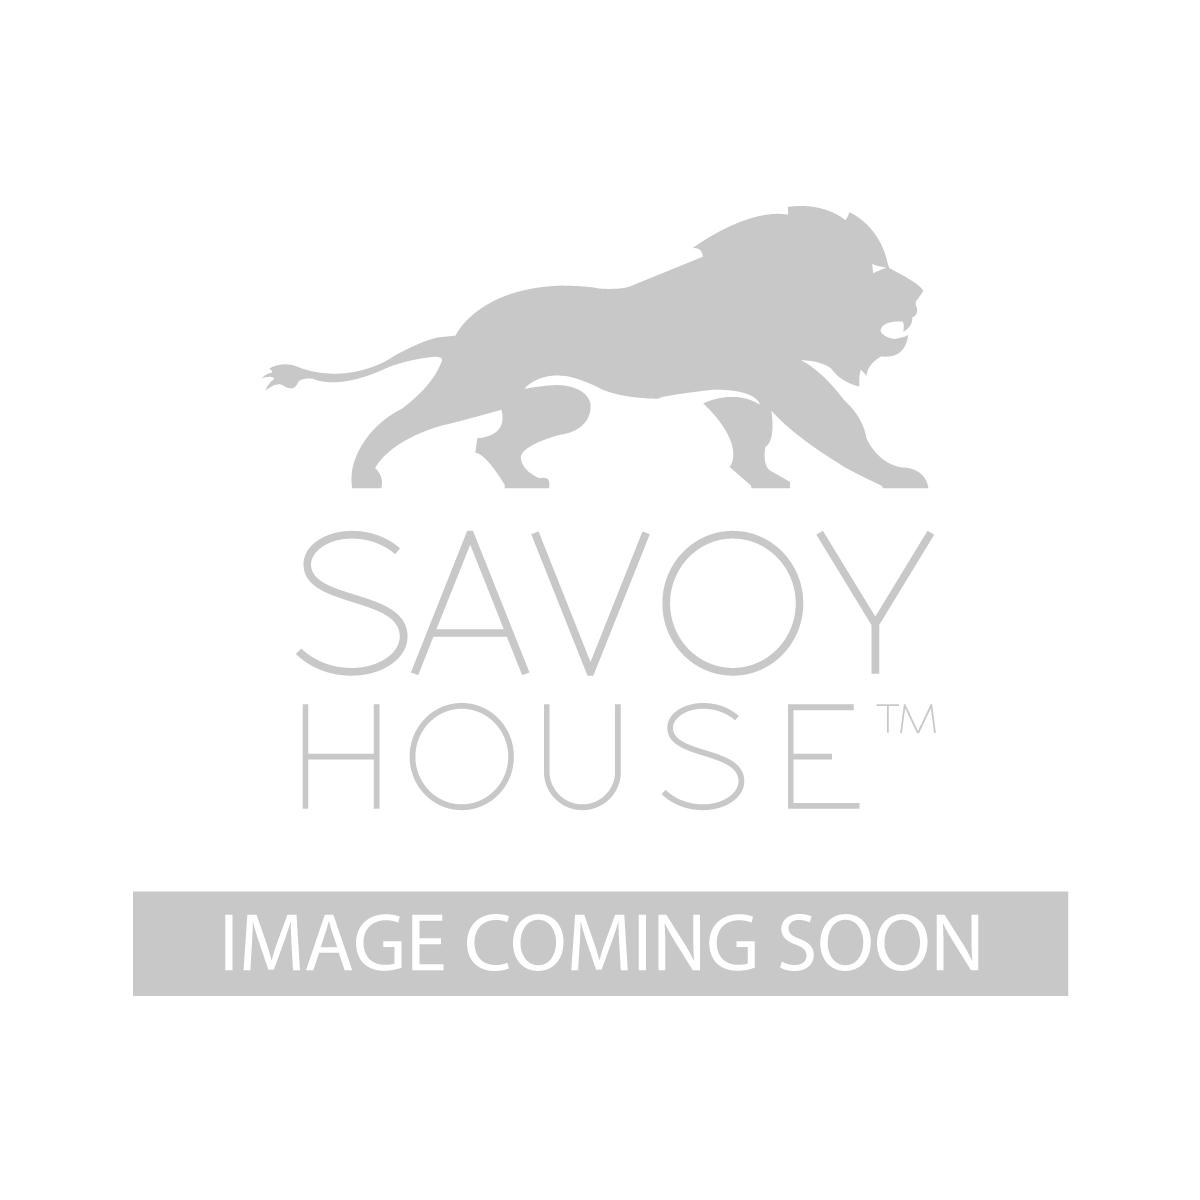 5 254 25 Monte Grande Wall Mount Lantern By Savoy House